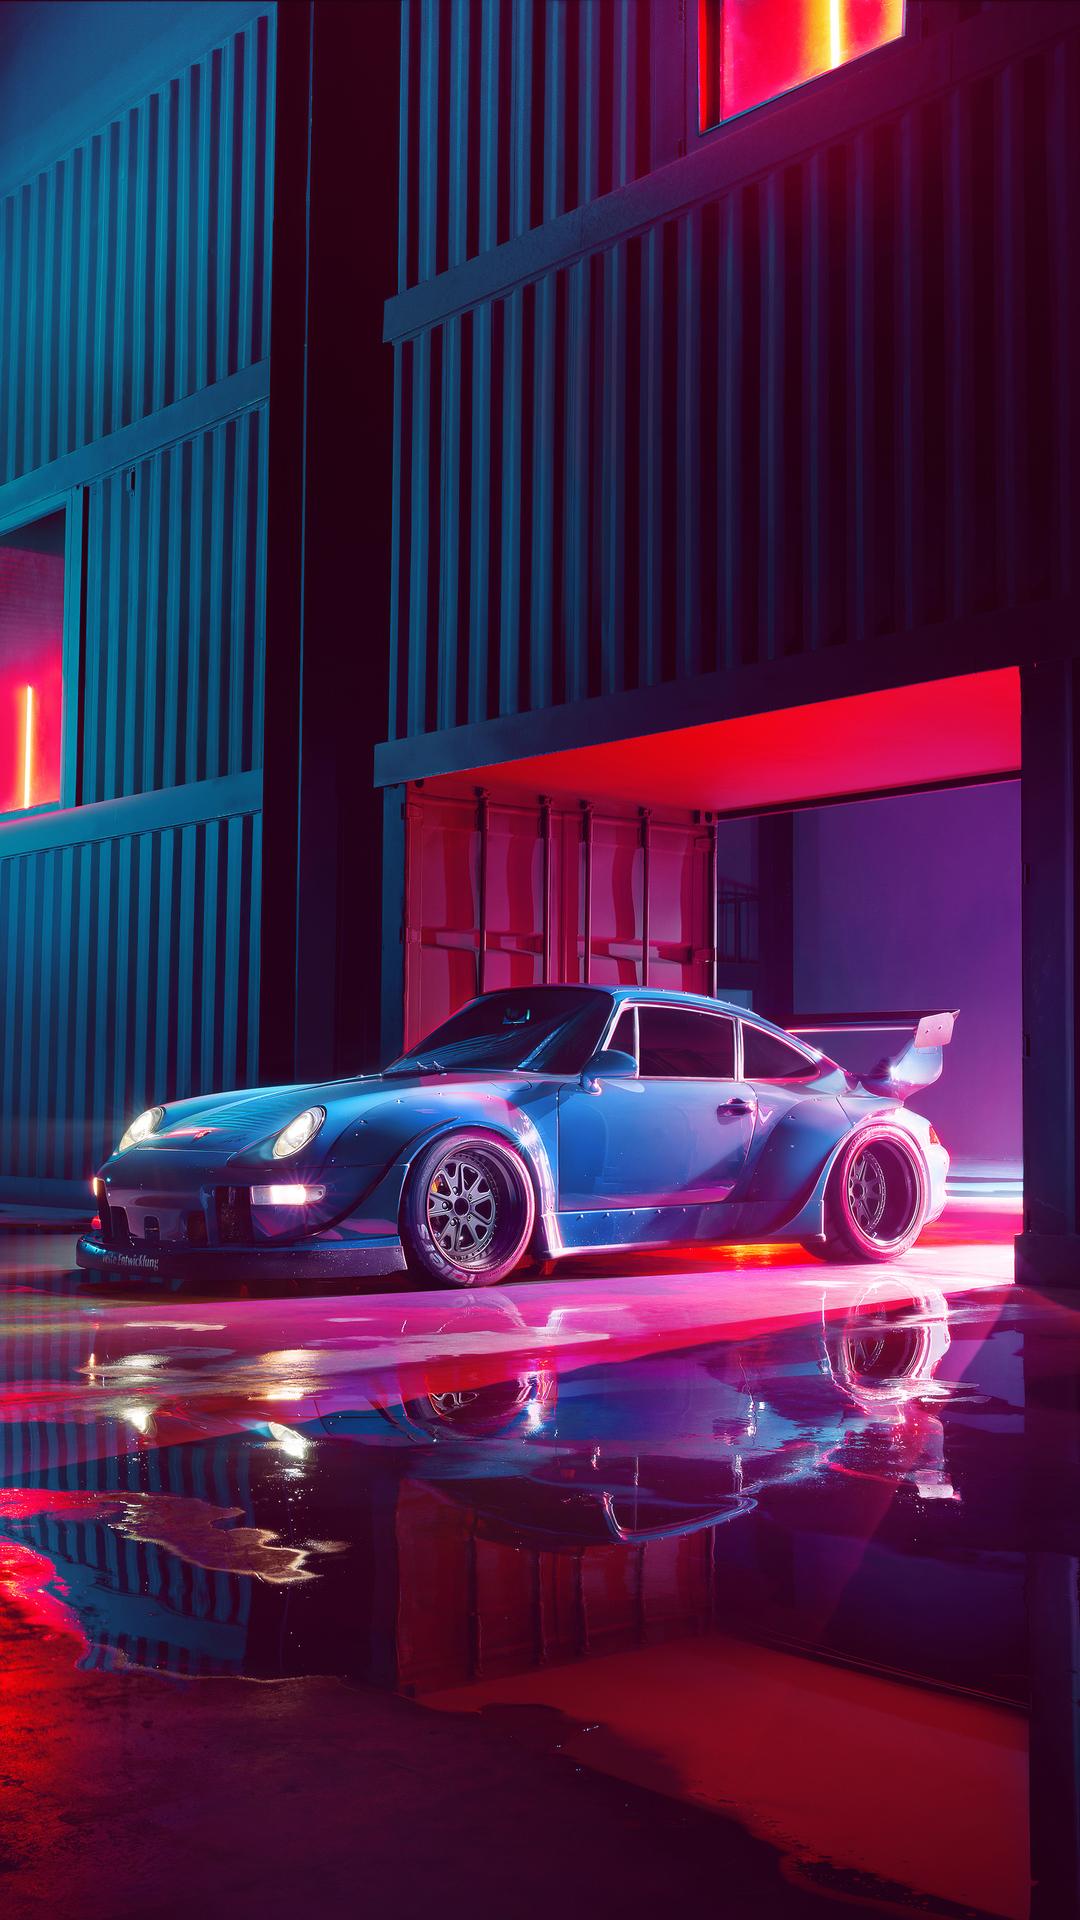 Wallpaper 4k Porsche Rwb